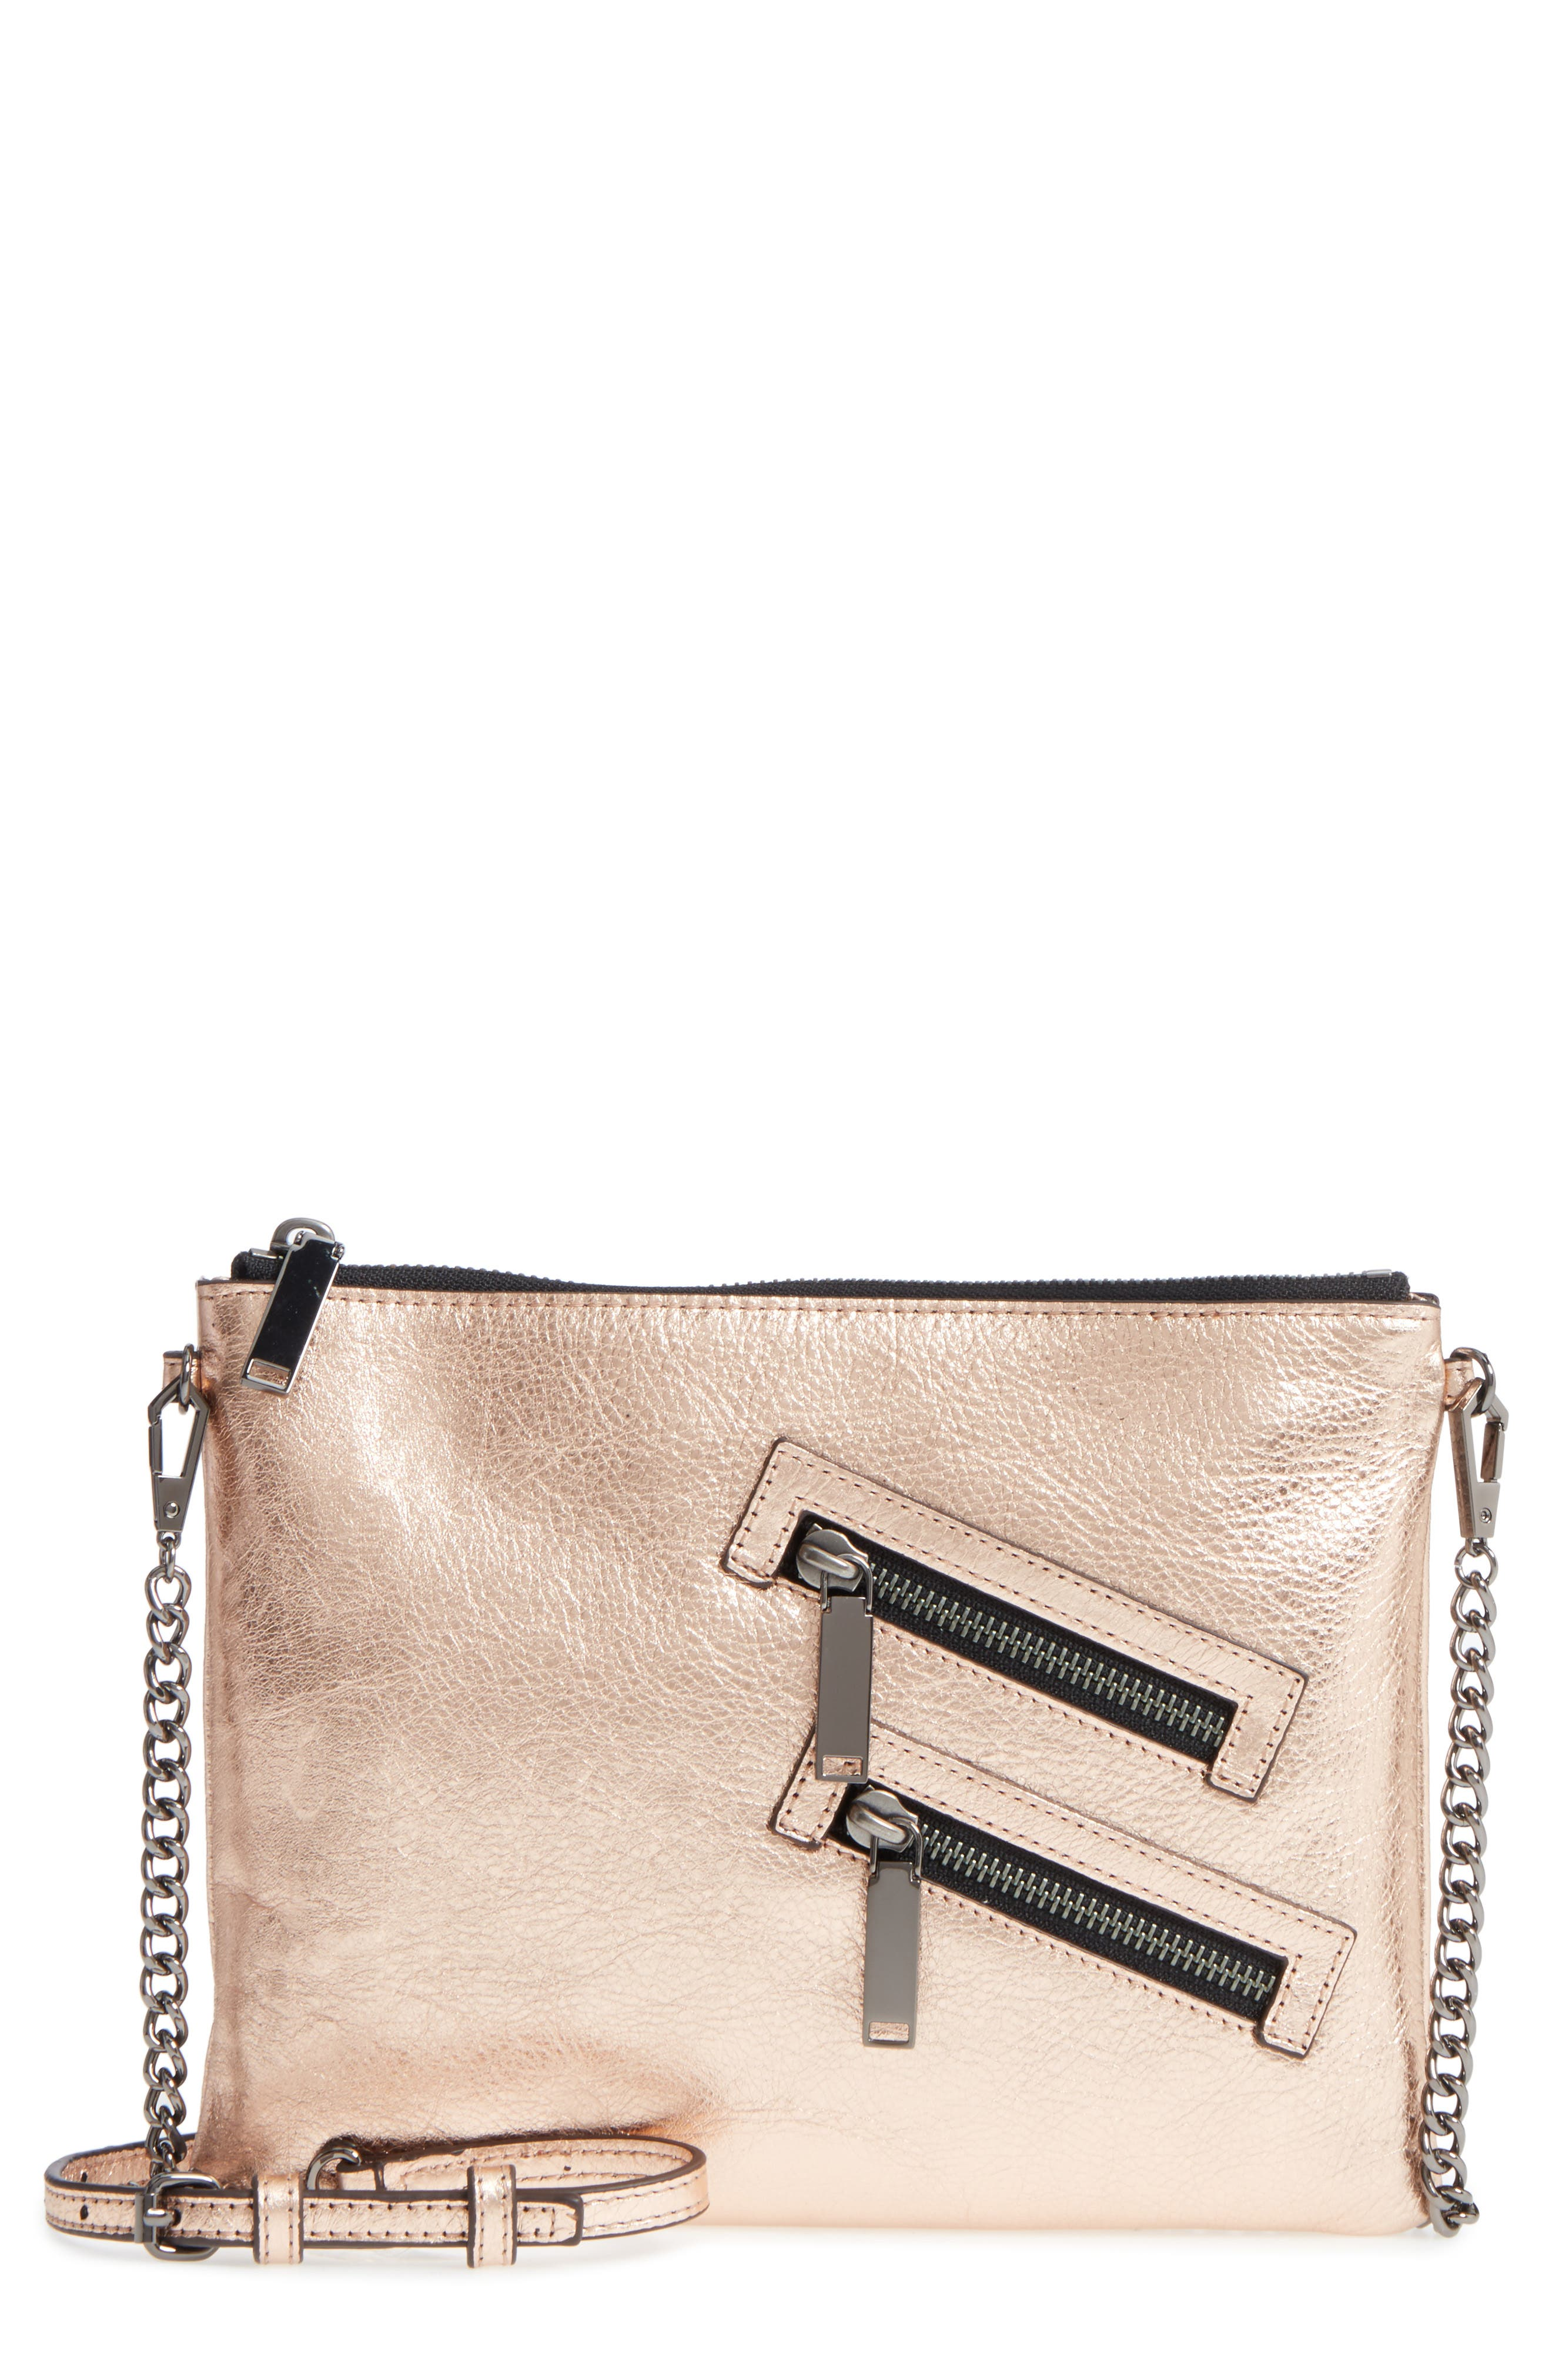 Rebecca Minkoff Jon Leather Crossbody Bag